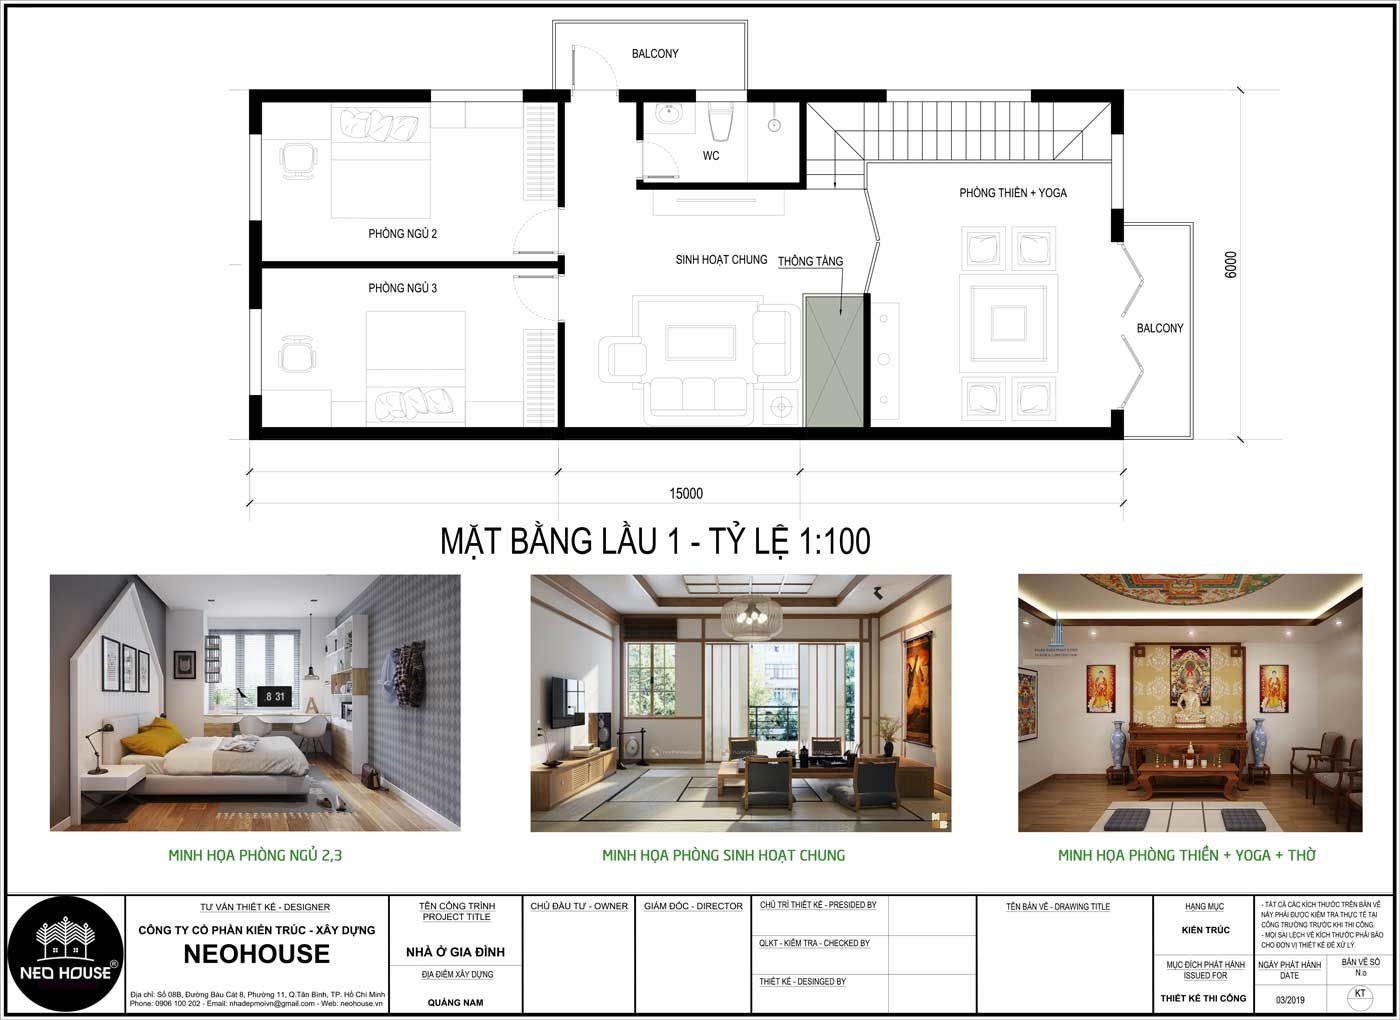 Thiet-ke-mat-bang-lau-1-biet-thu-3500-3500